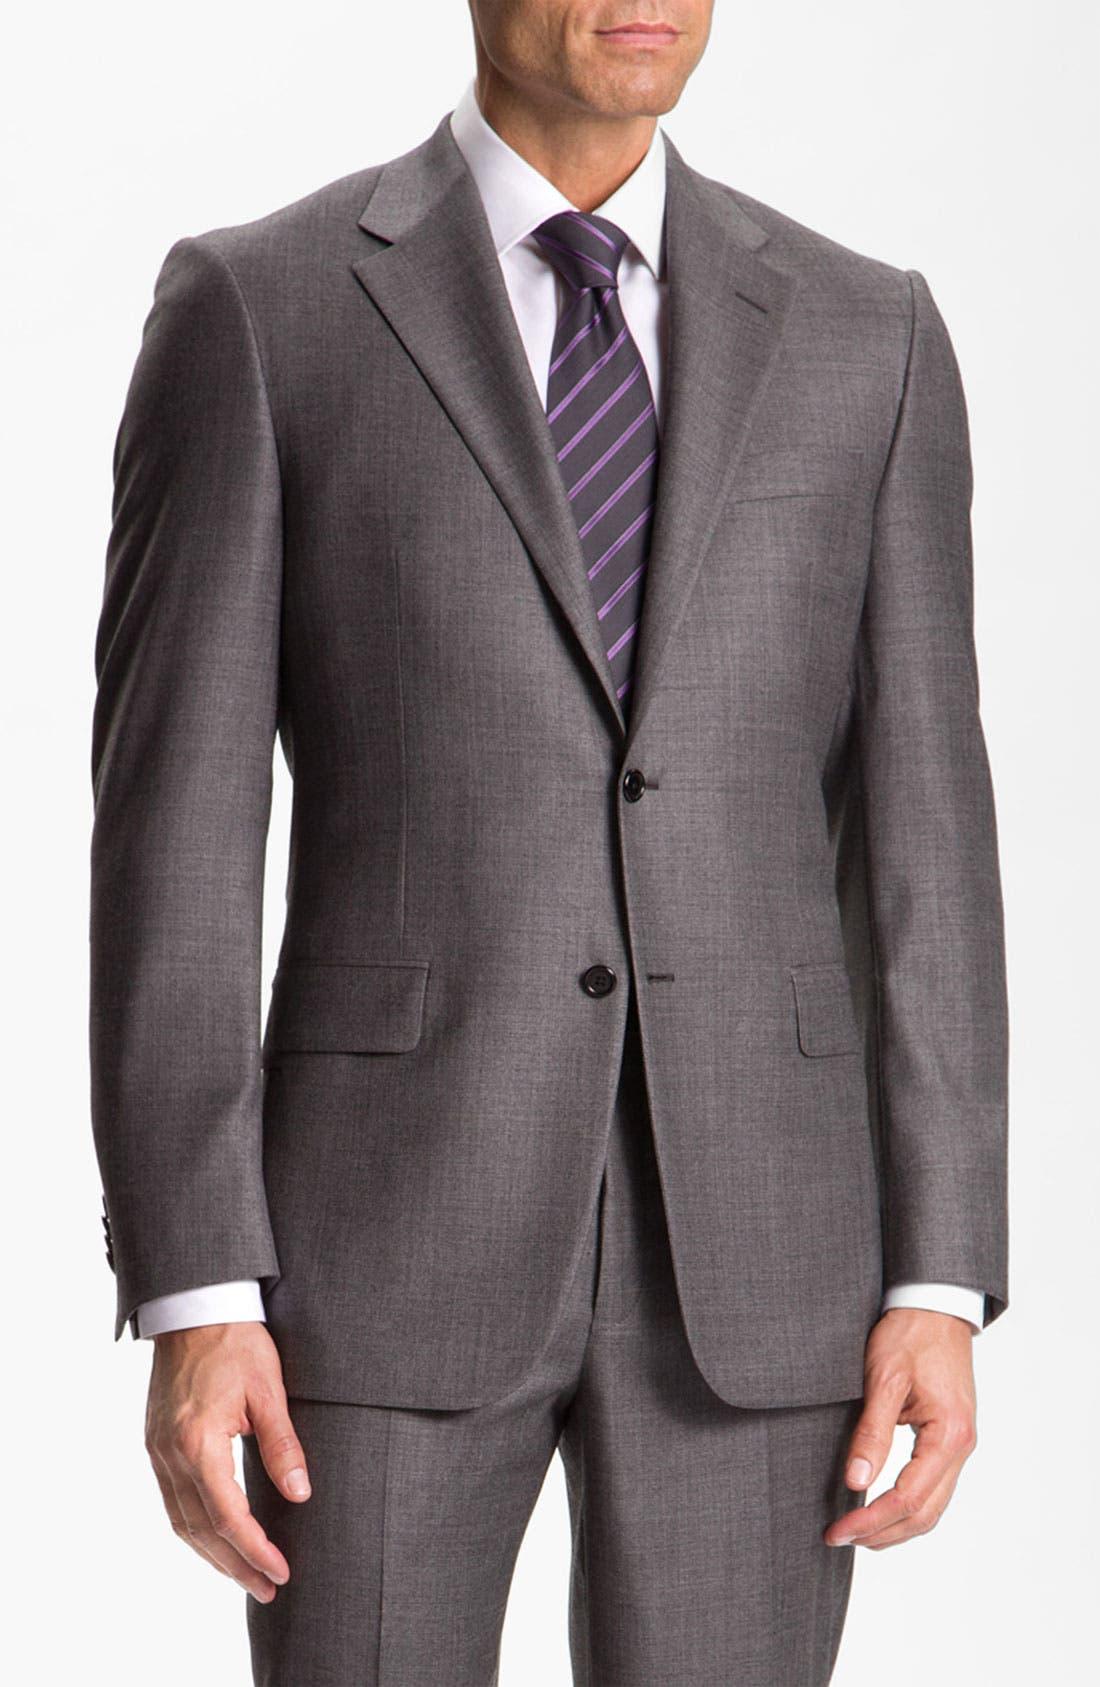 Alternate Image 1 Selected - Hickey Freeman Solid Wool Suit